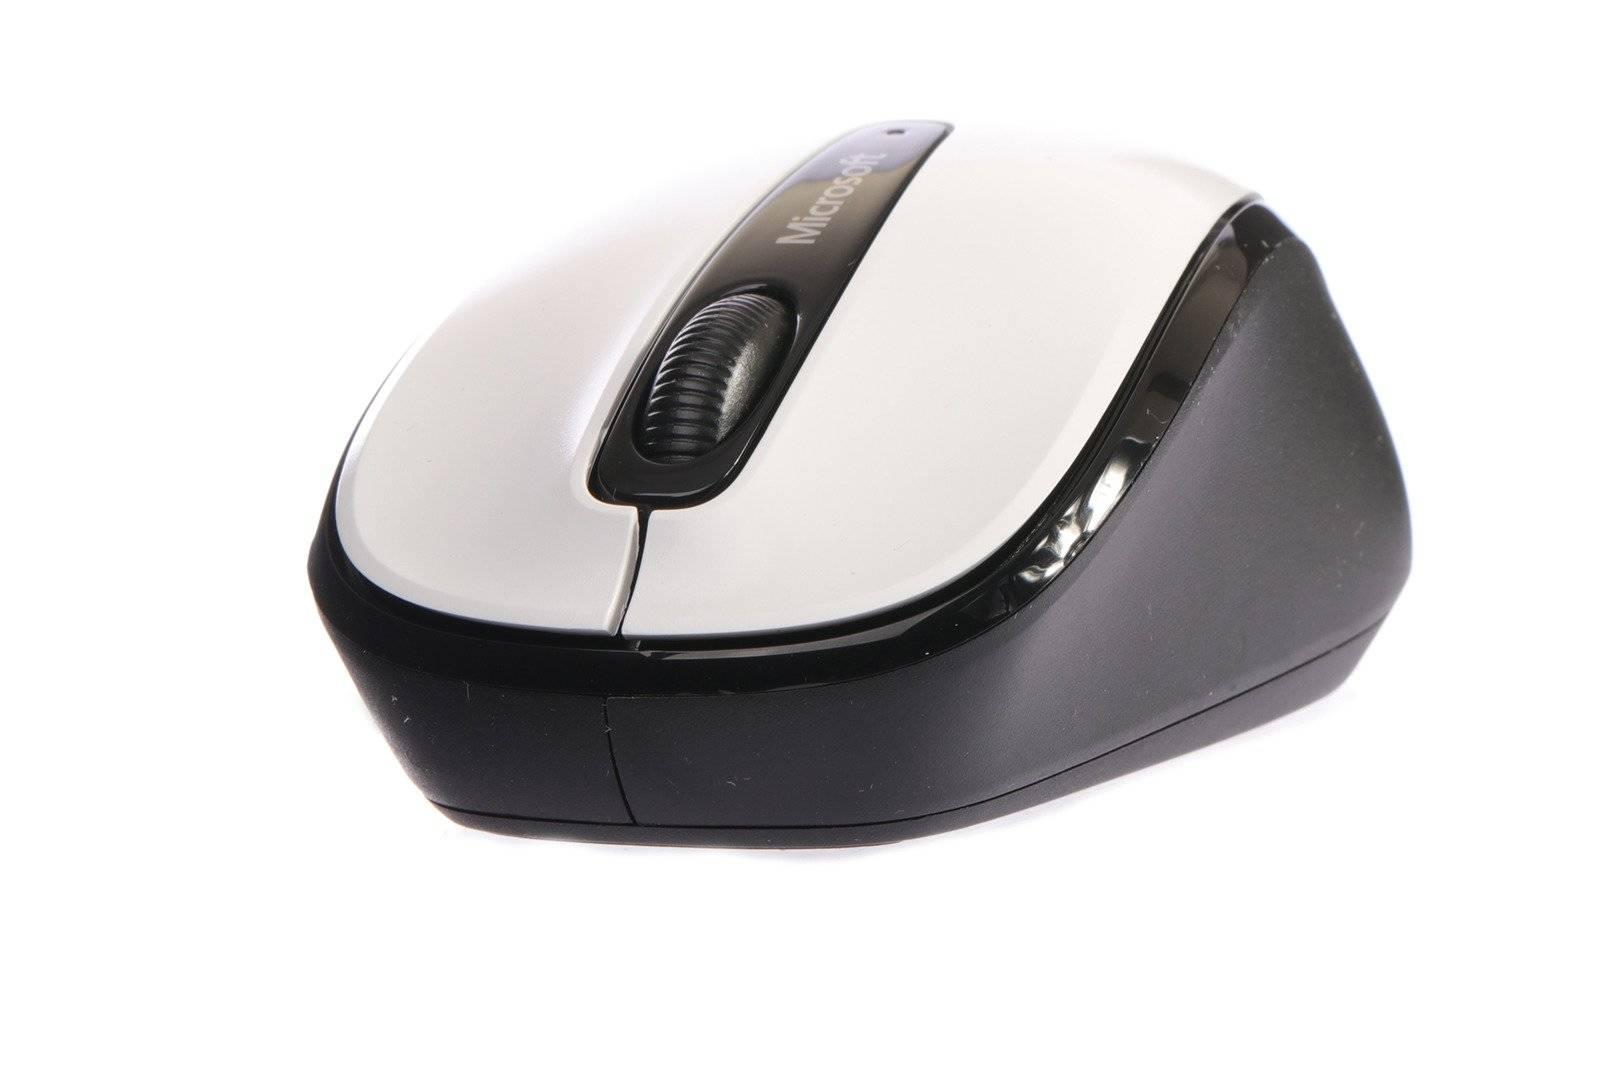 Mouse Microsoft Wireless Mobile 3500 White